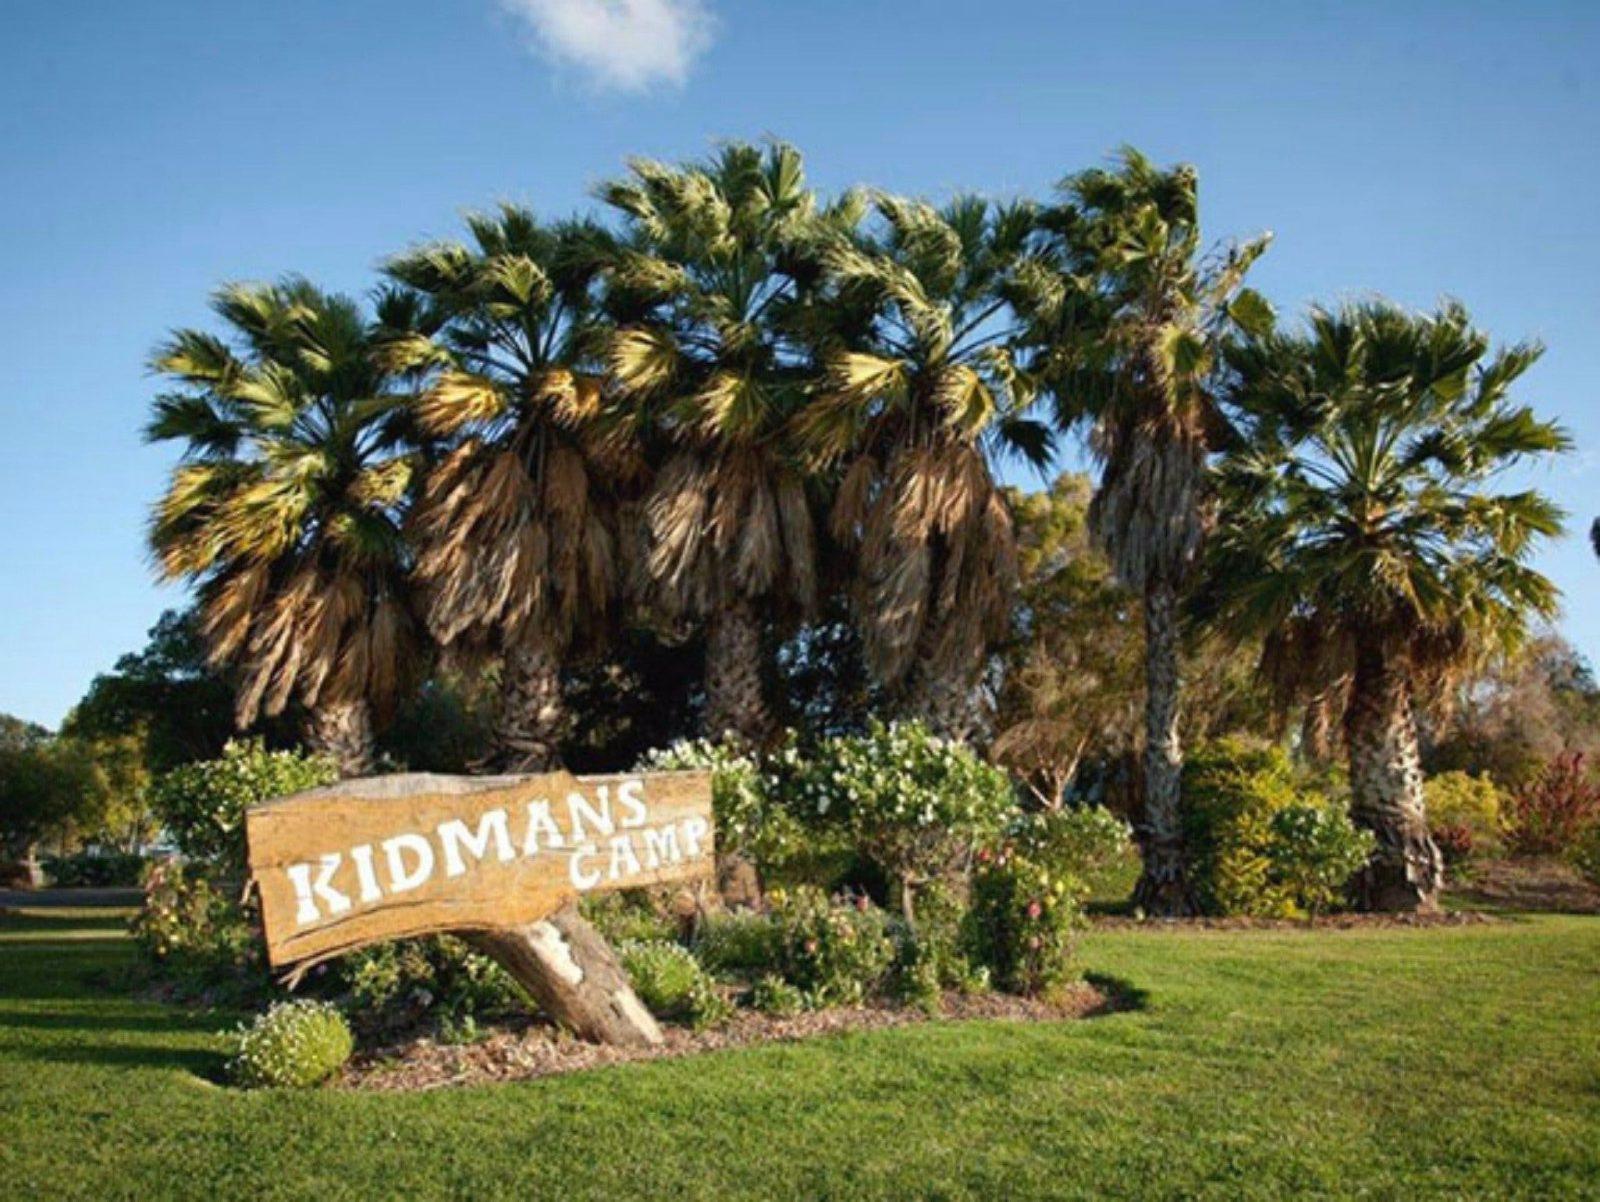 Kidmans Camp entry sign